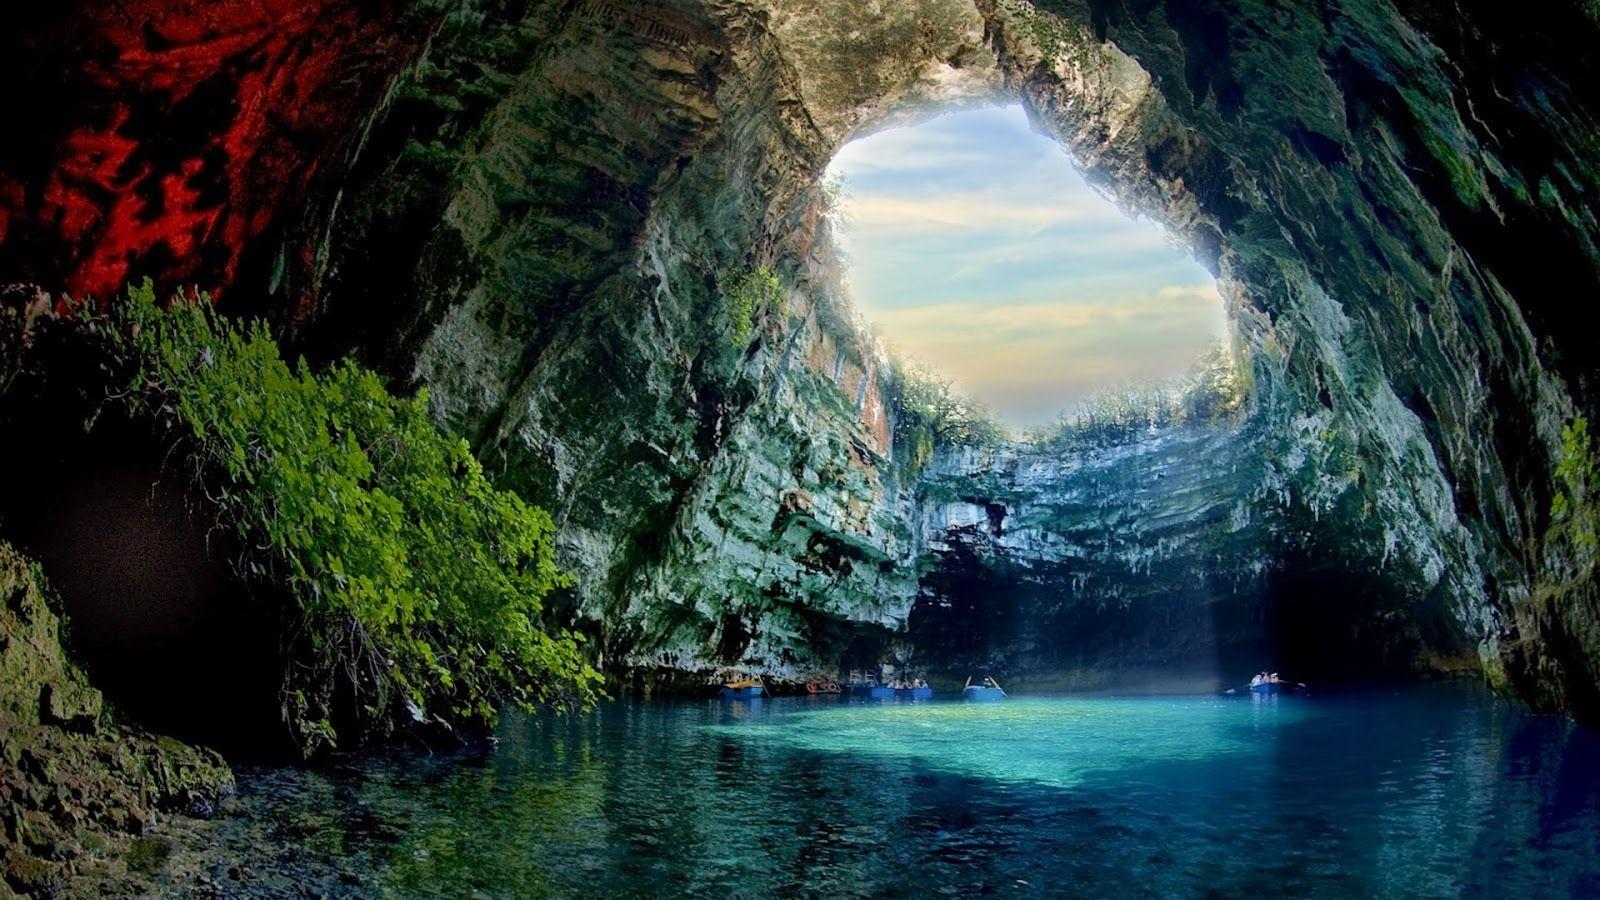 Paisajes Impresionantes De La Naturaleza: Imagenes Impresionantes De Paisajes Naturales